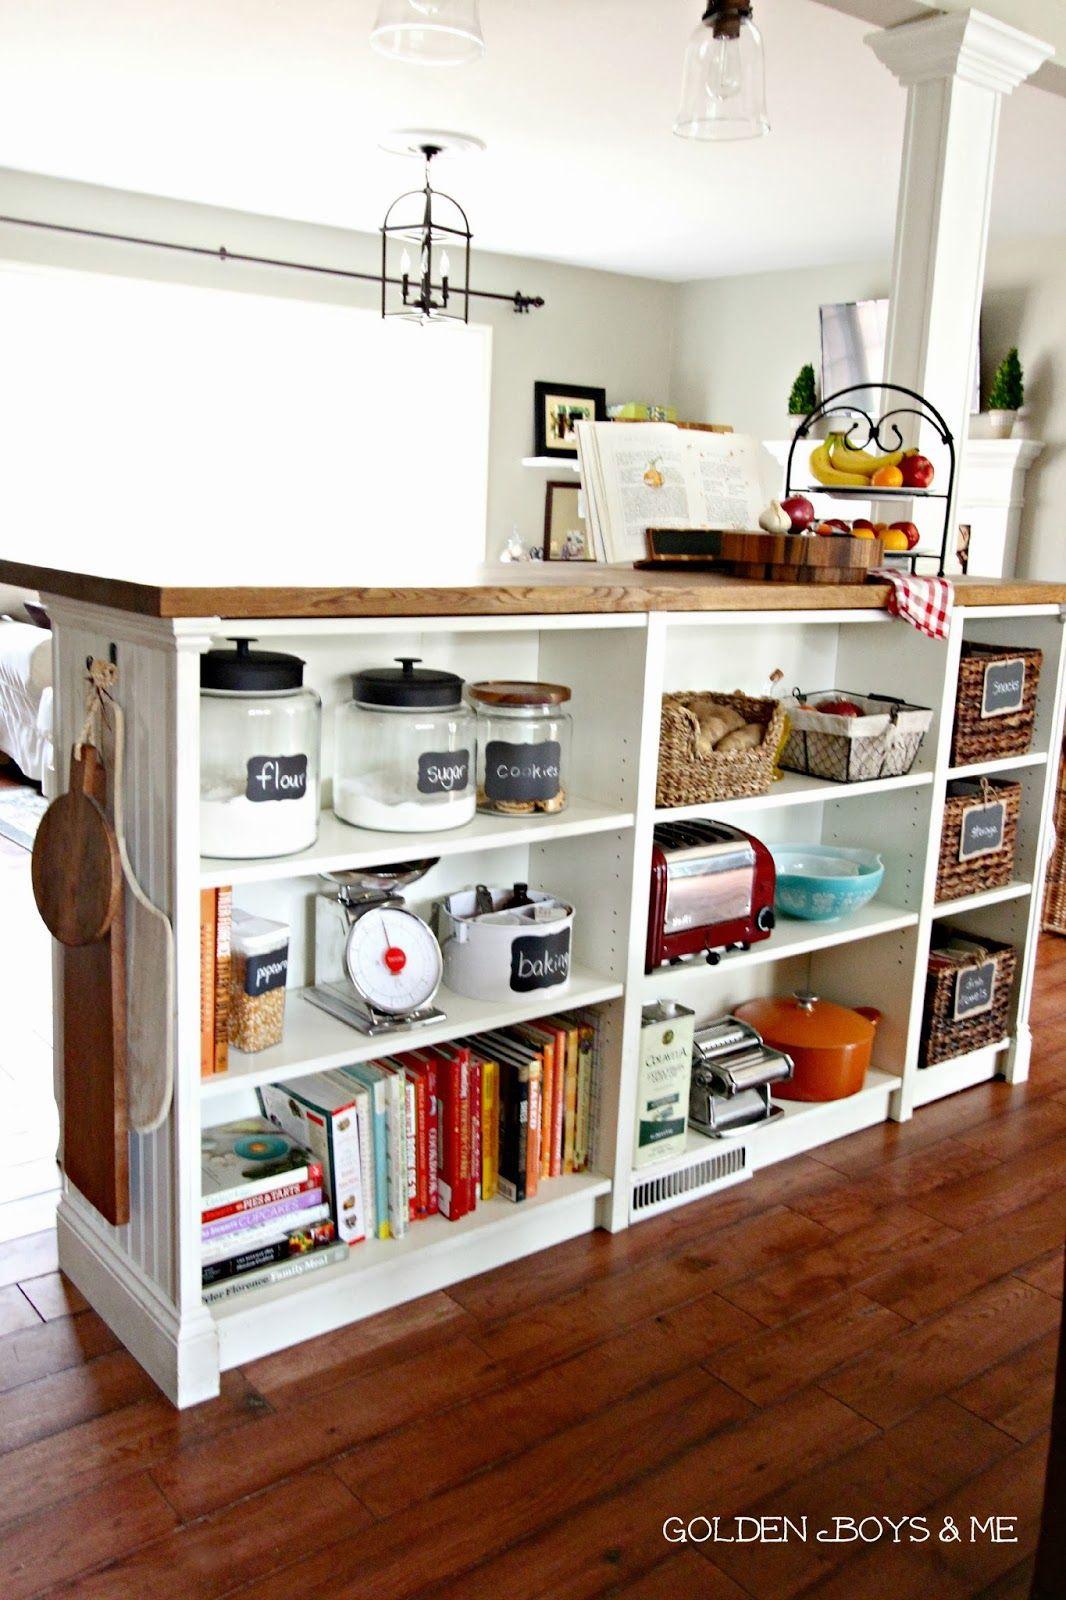 12 ikea kitchen ideas - organize your kitchen with ikea hacks